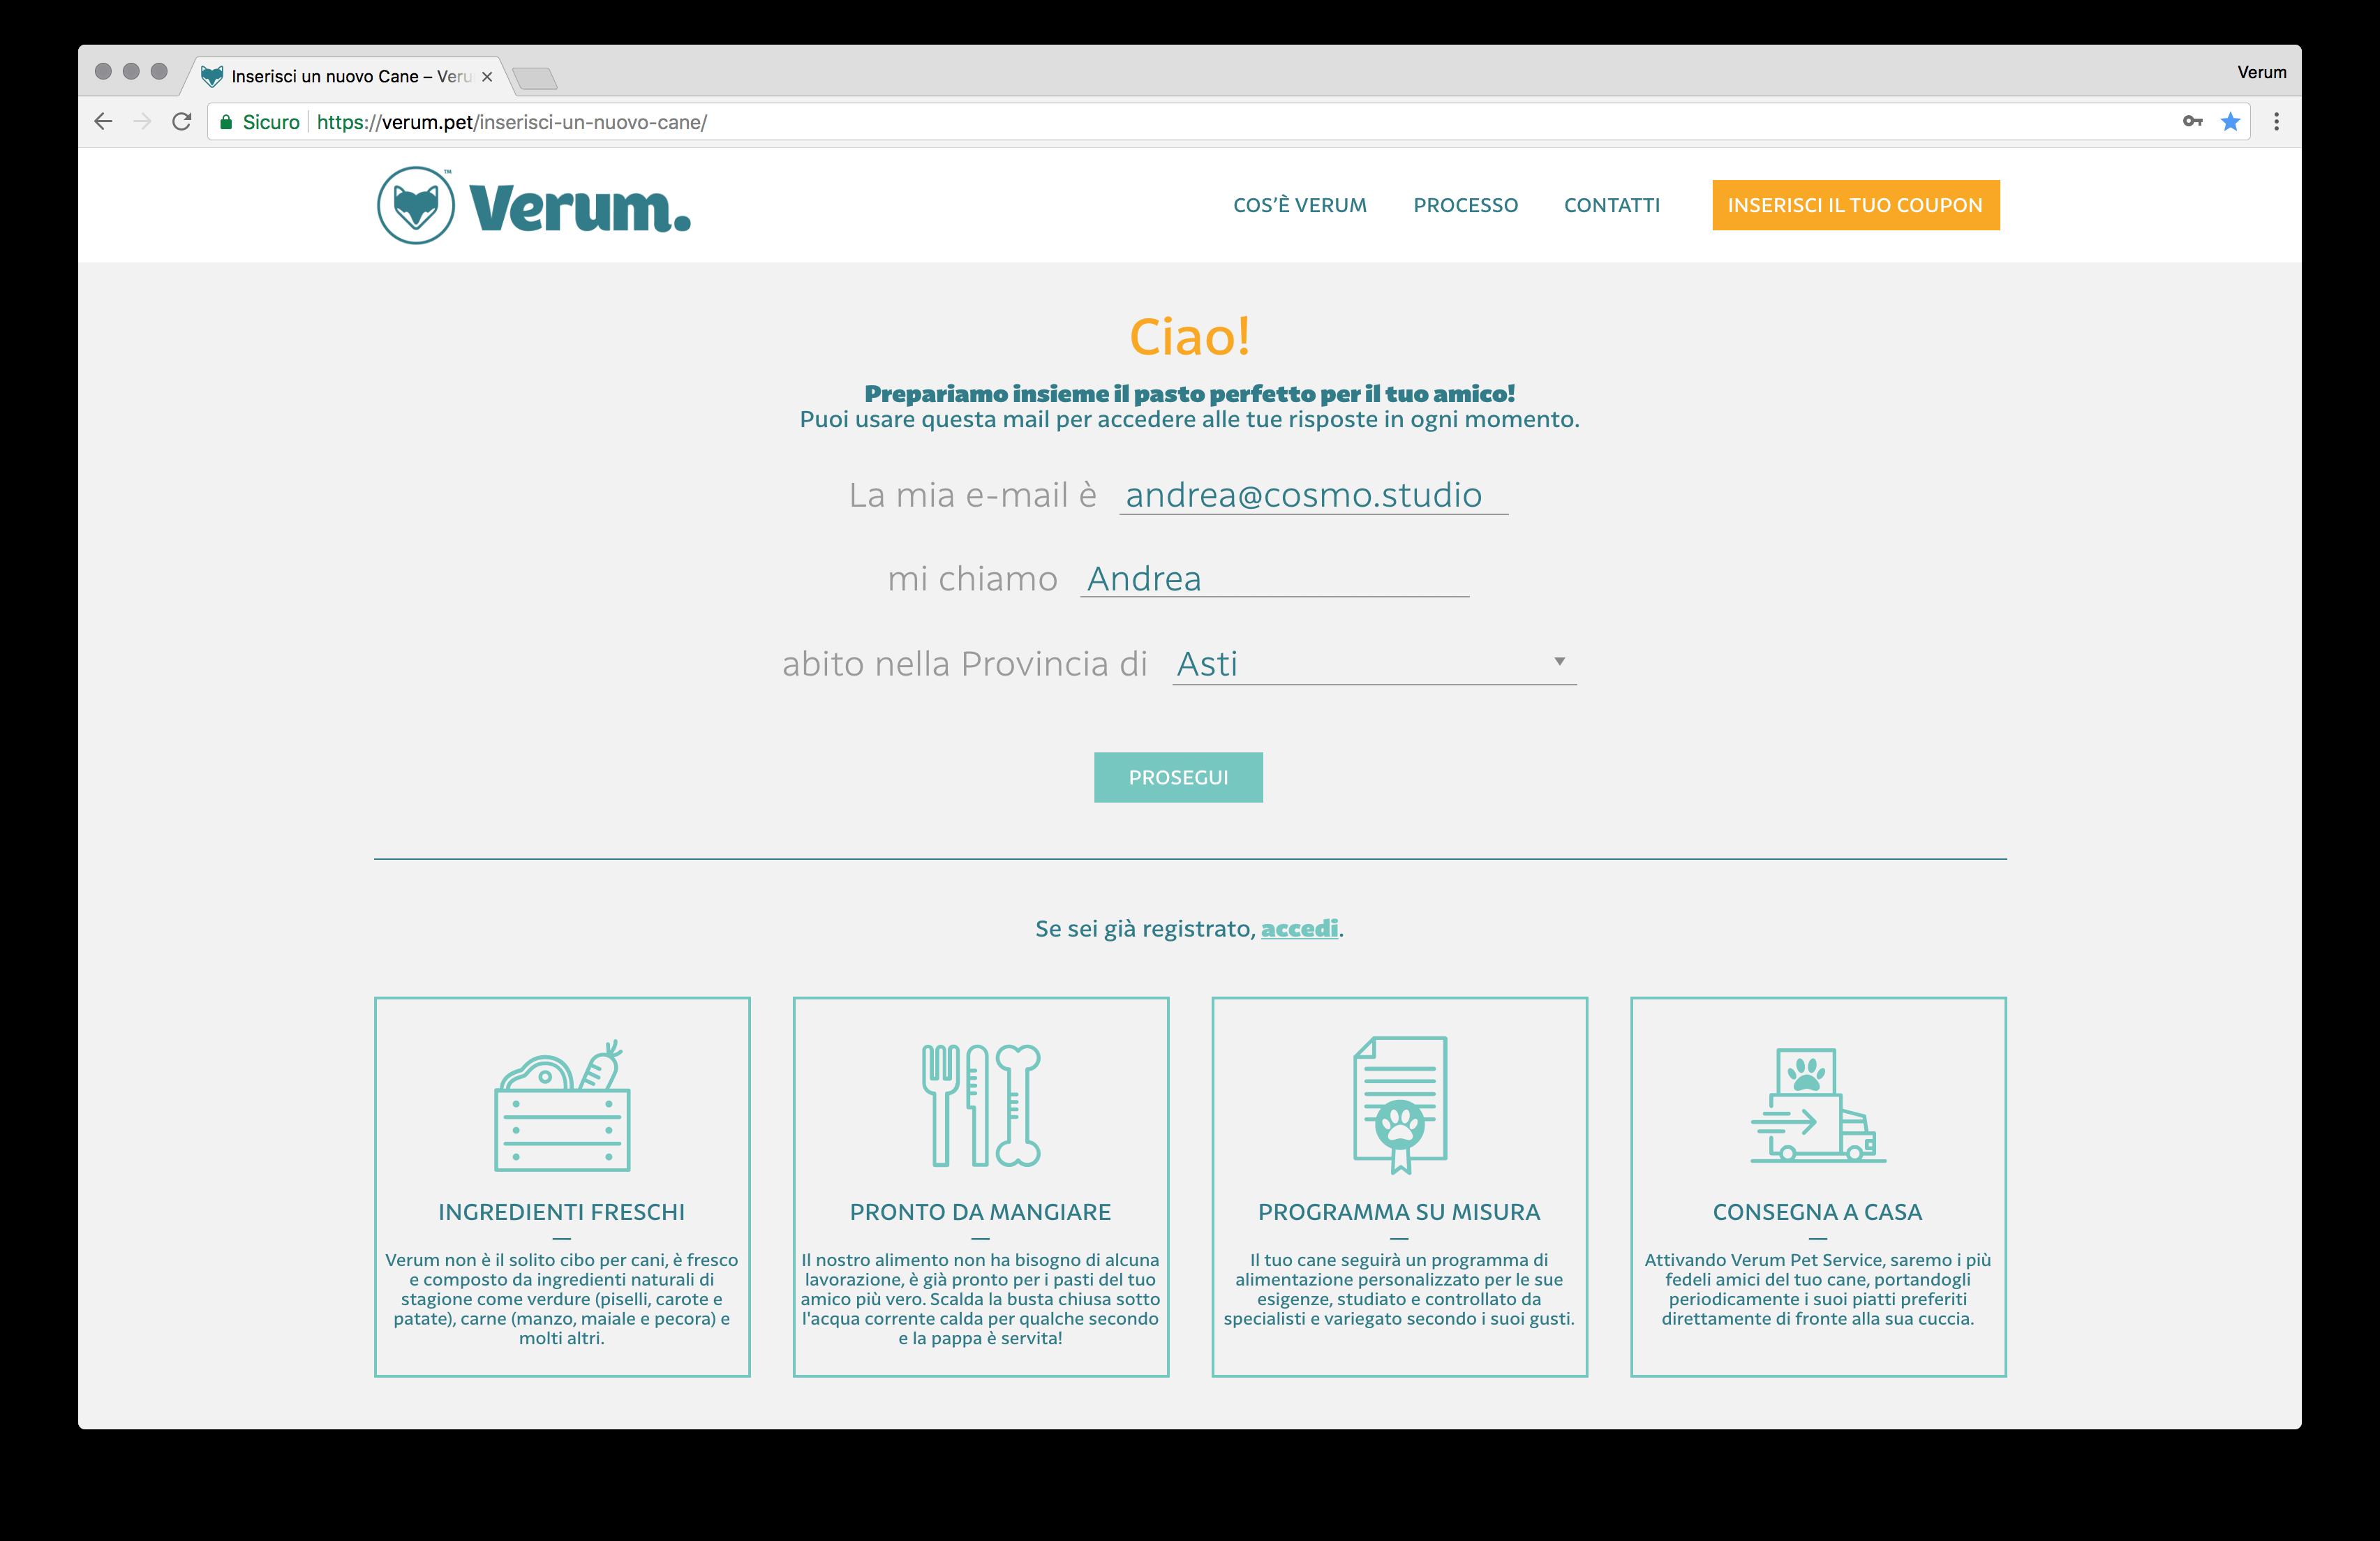 Registrazione-utente-Verum